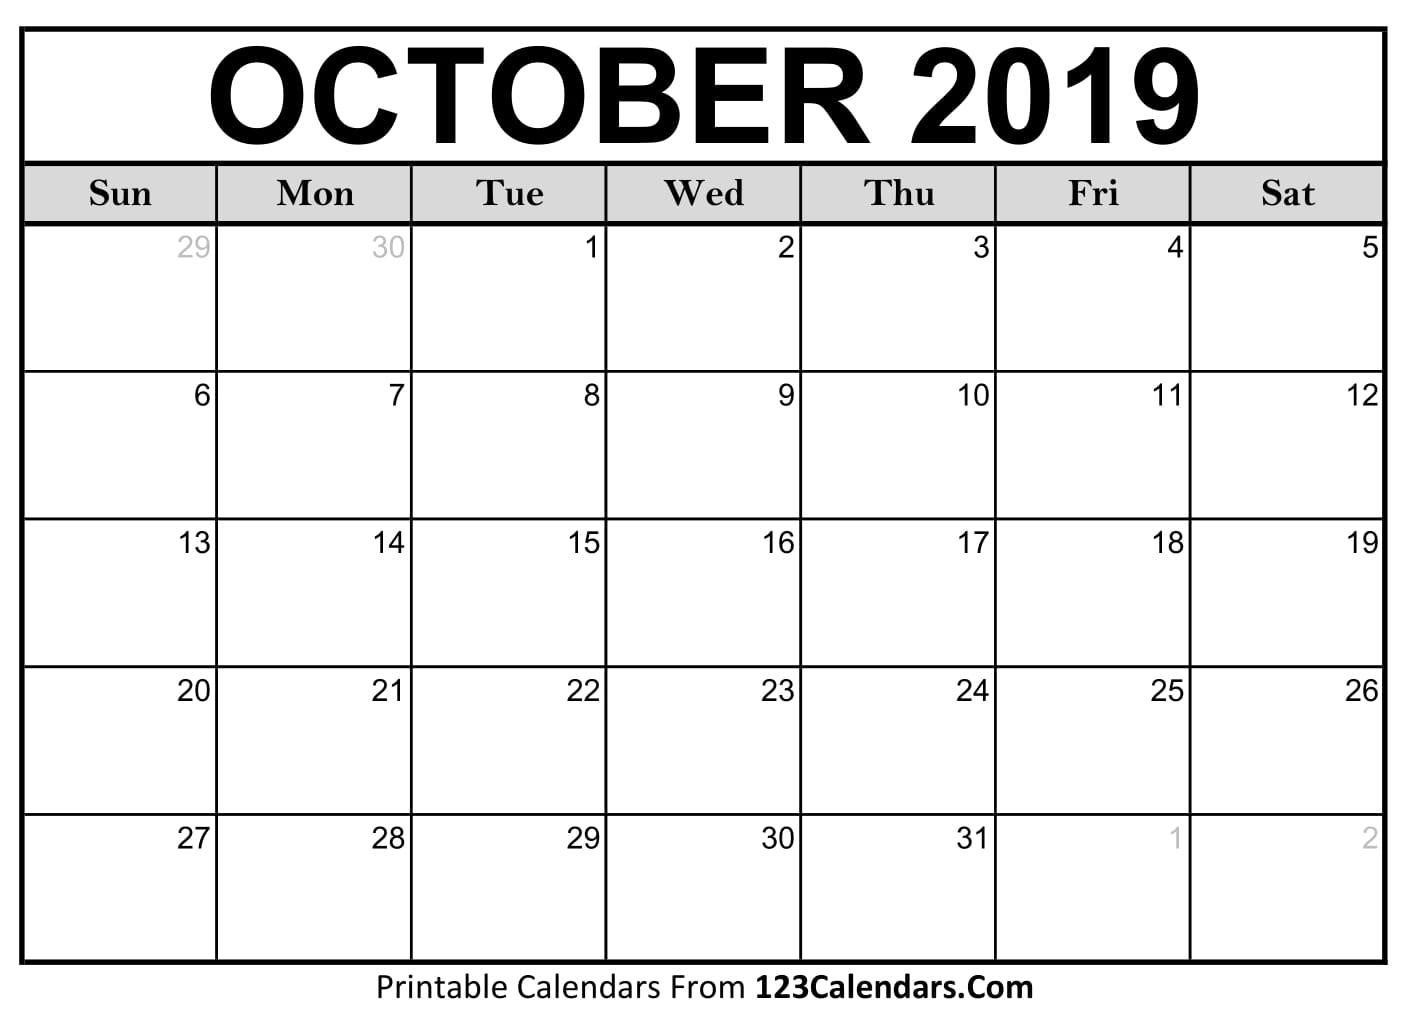 October 2019 Printable Calendar | 123Calendars with Calendar 2019 October To December